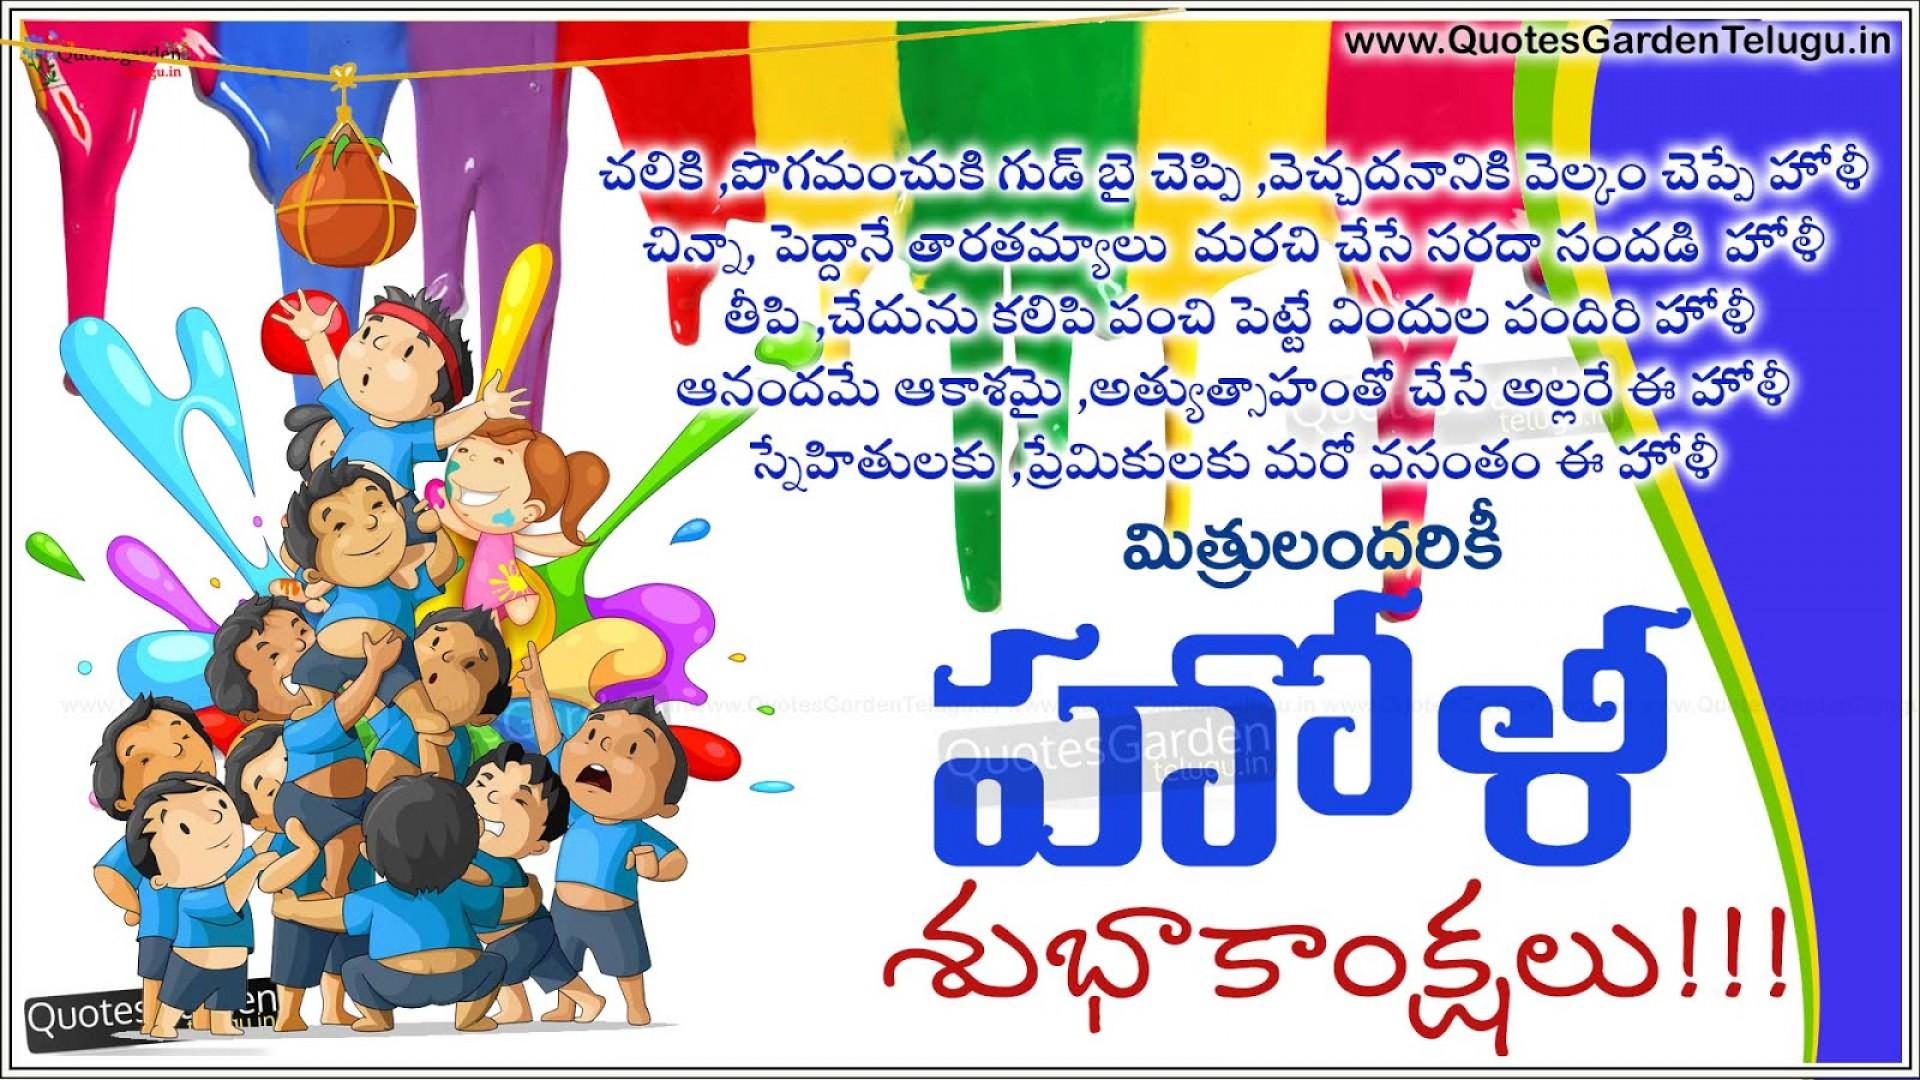 022 New2blatest2btelugu2bholi2bgreetings2bwallpapers Holi Festival Essay Top Of Colours In Hindi Punjabi Language For Class 2 1920